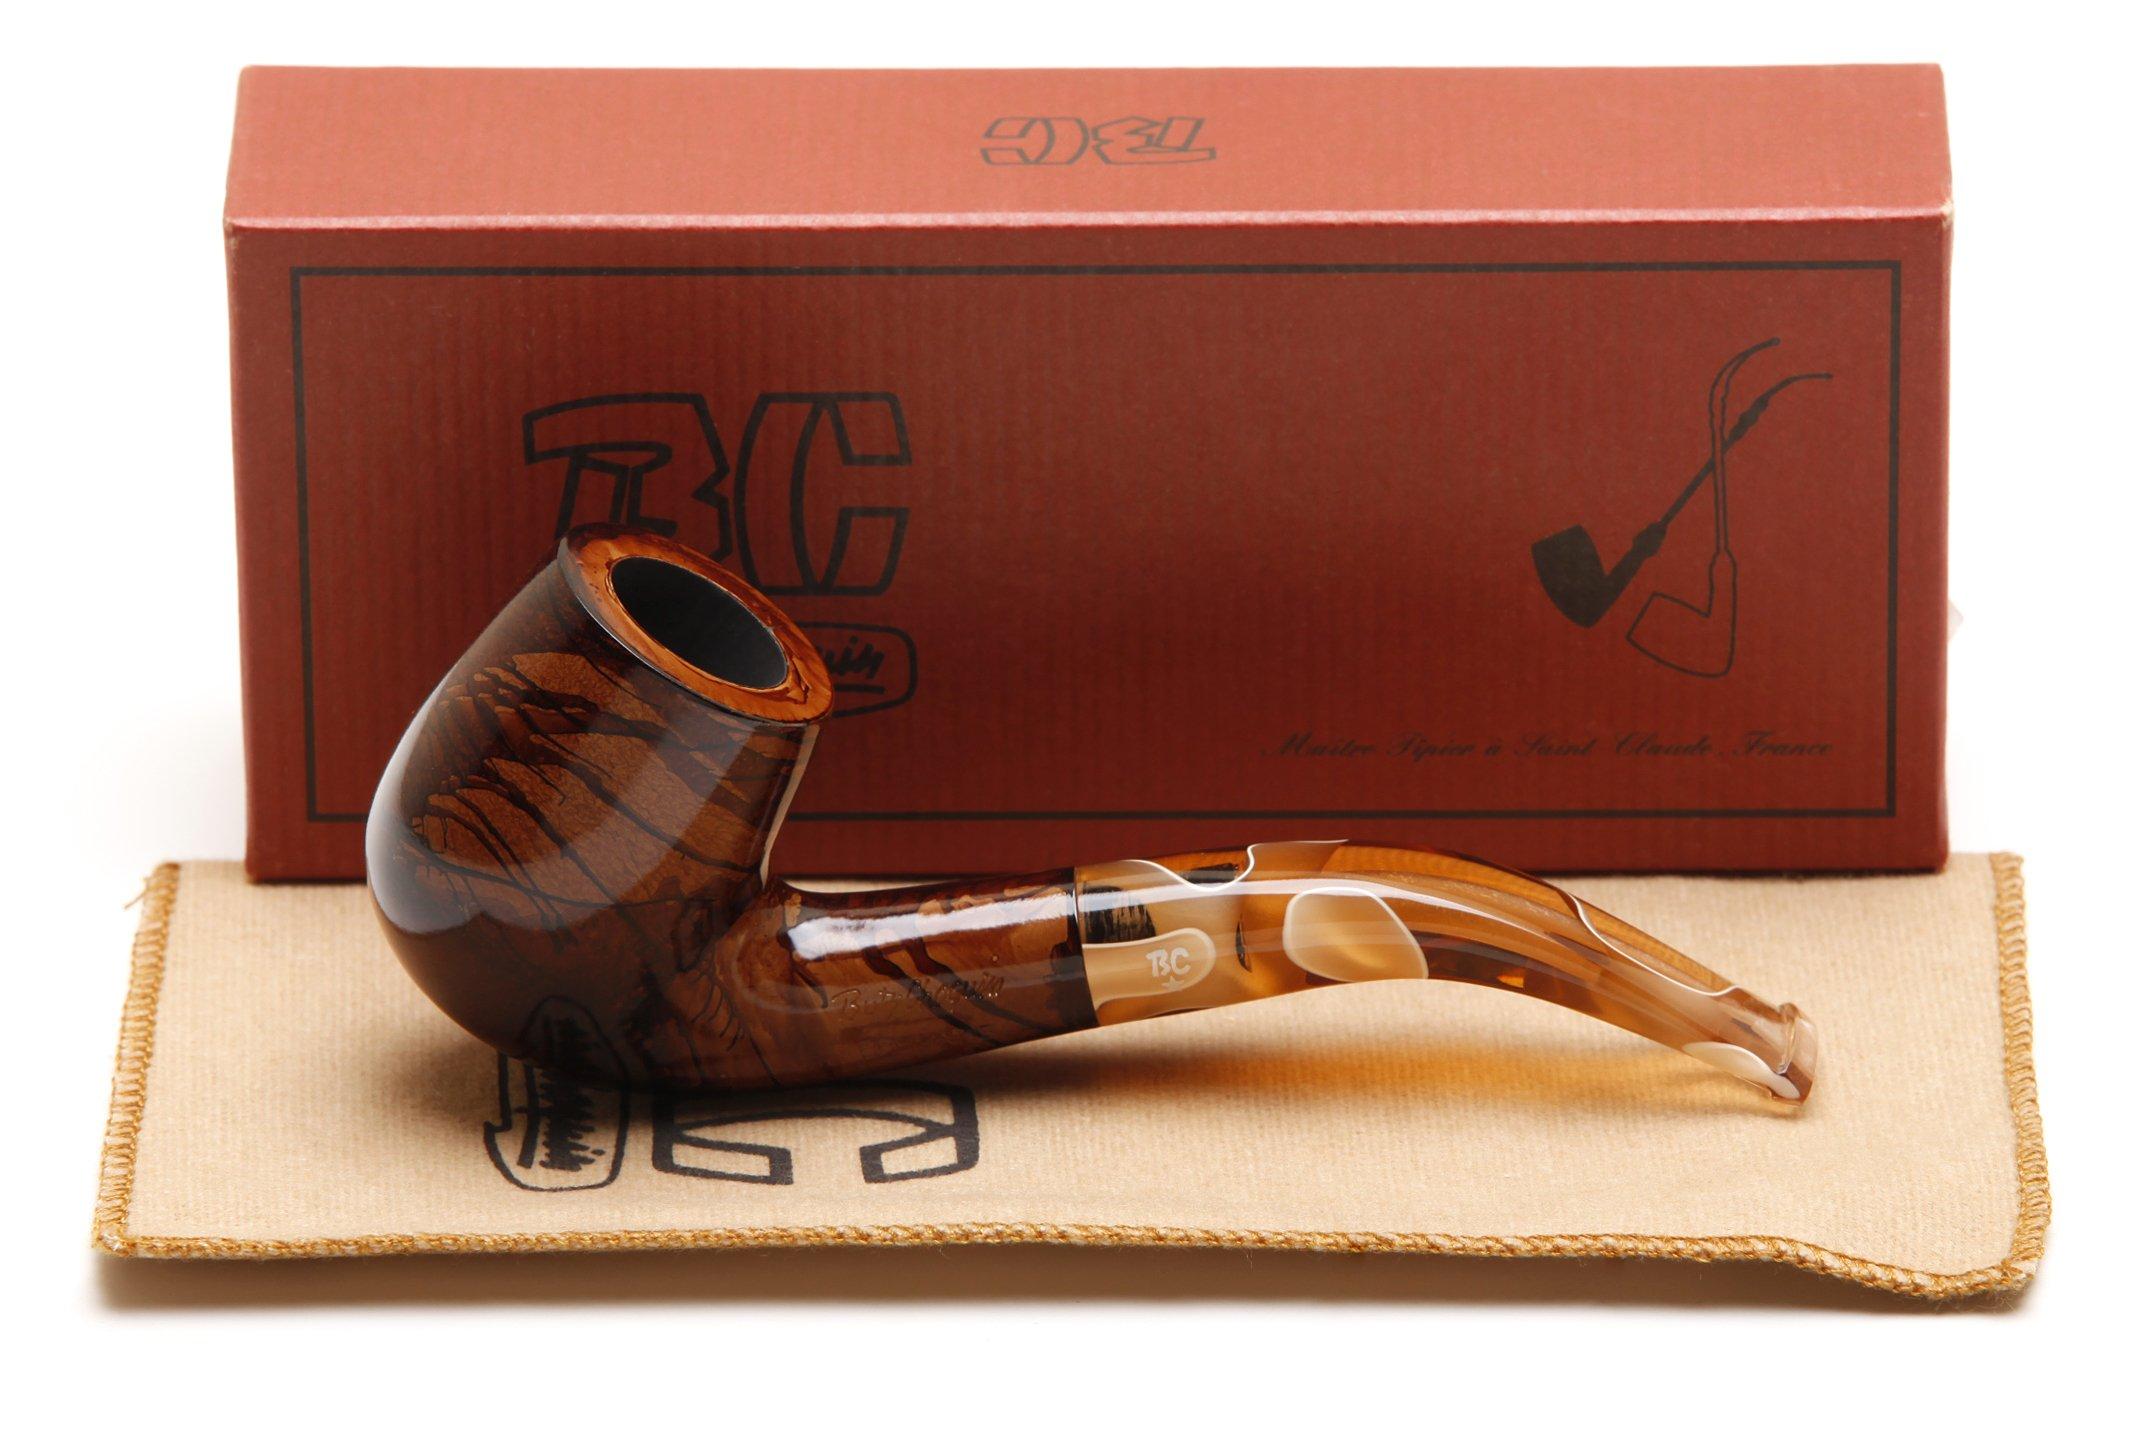 BC Brumaire 1304 Tobacco Pipe